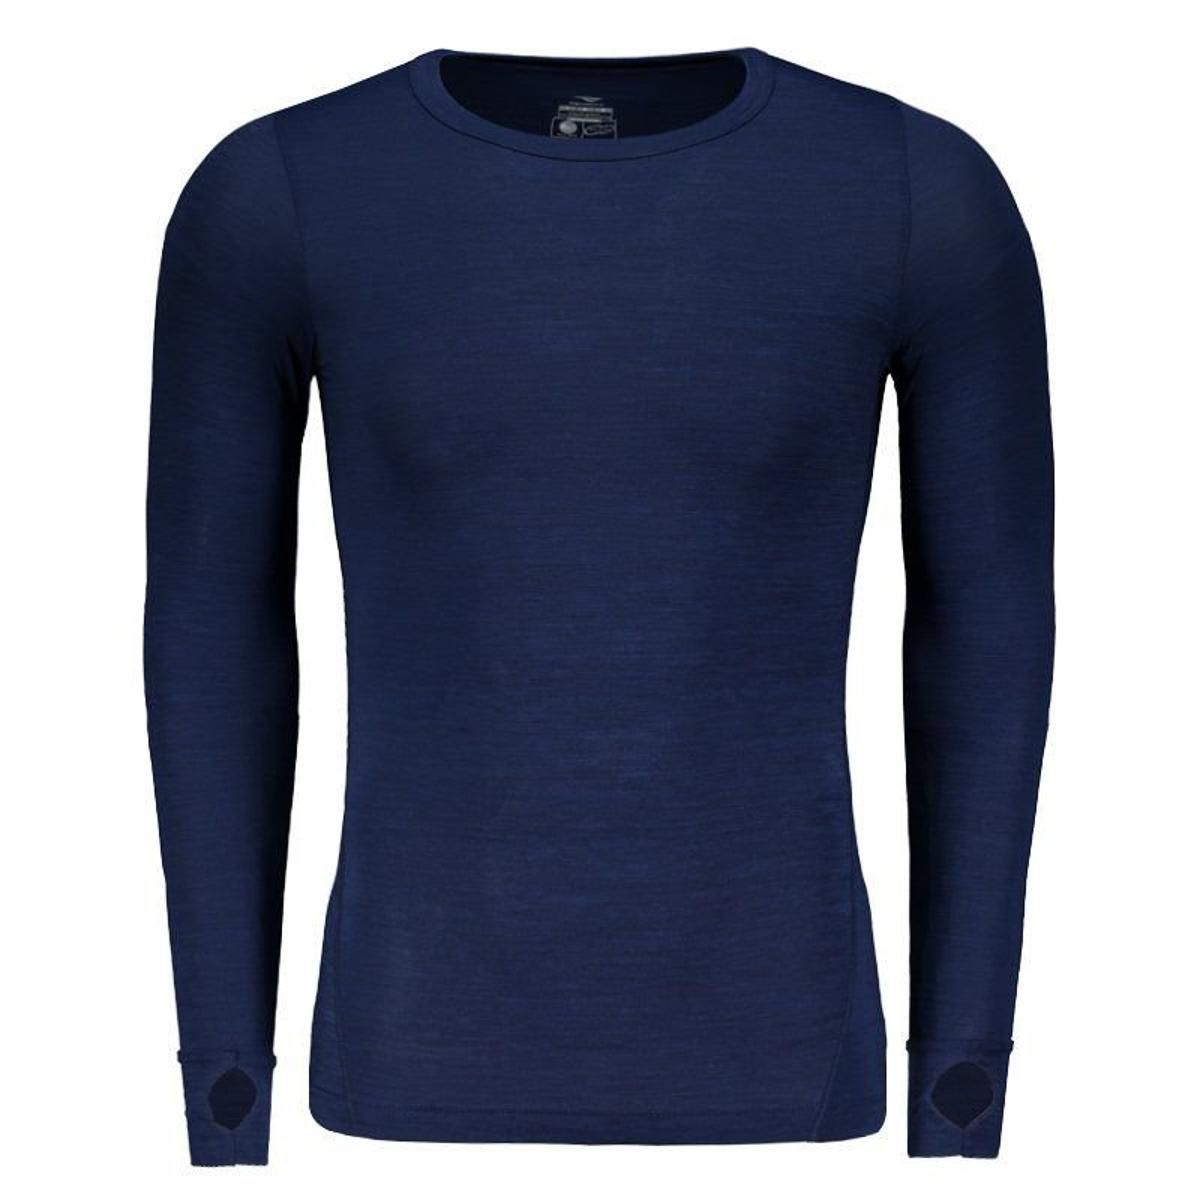 Camisa Penalty compressão Max Flex Uv 50 - Azul - Titanes Esportes cd5b046fb5696